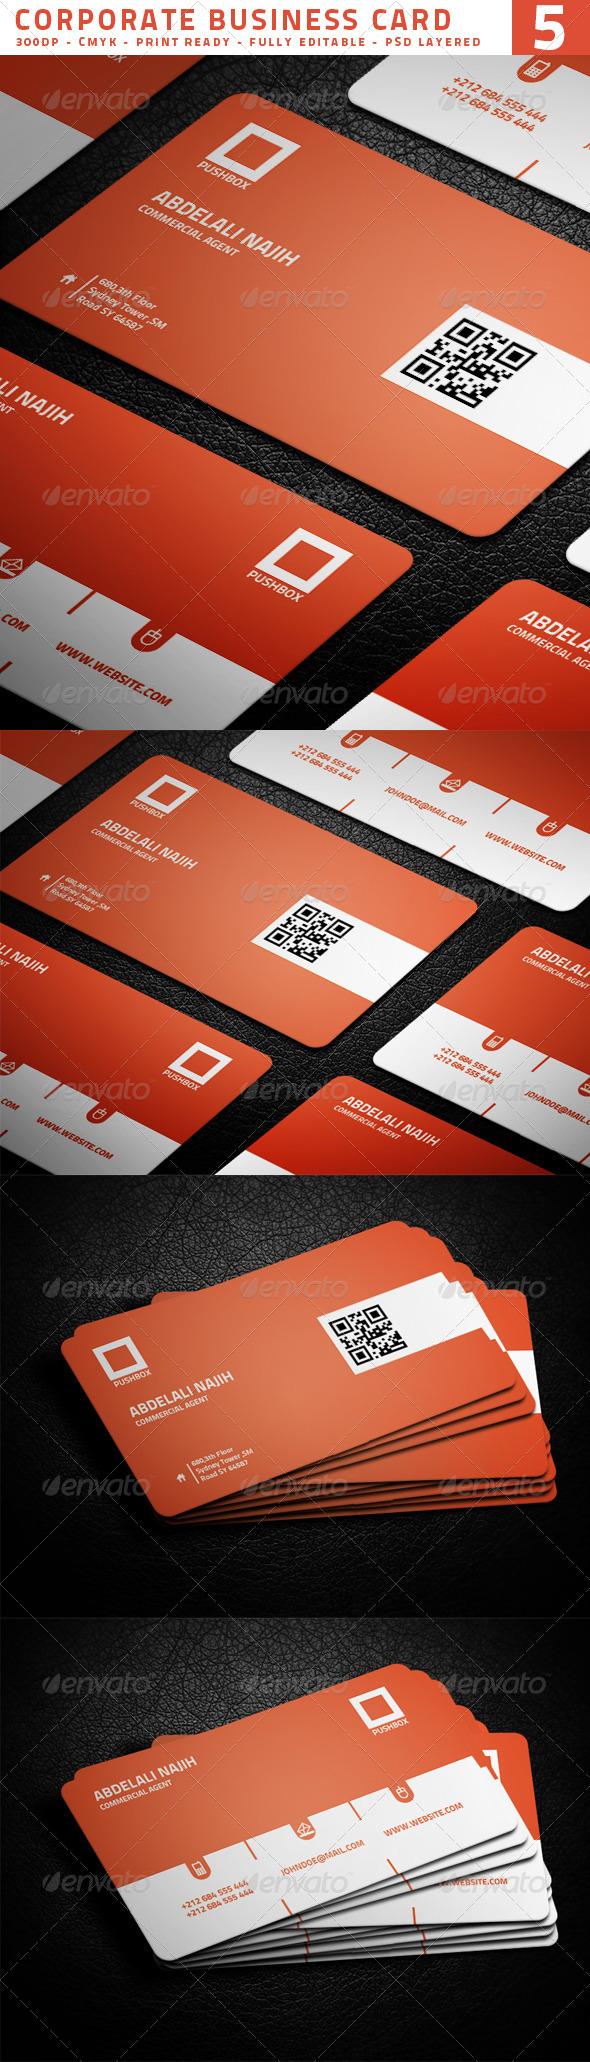 Corporate Business Card 5 - Corporate Business Cards